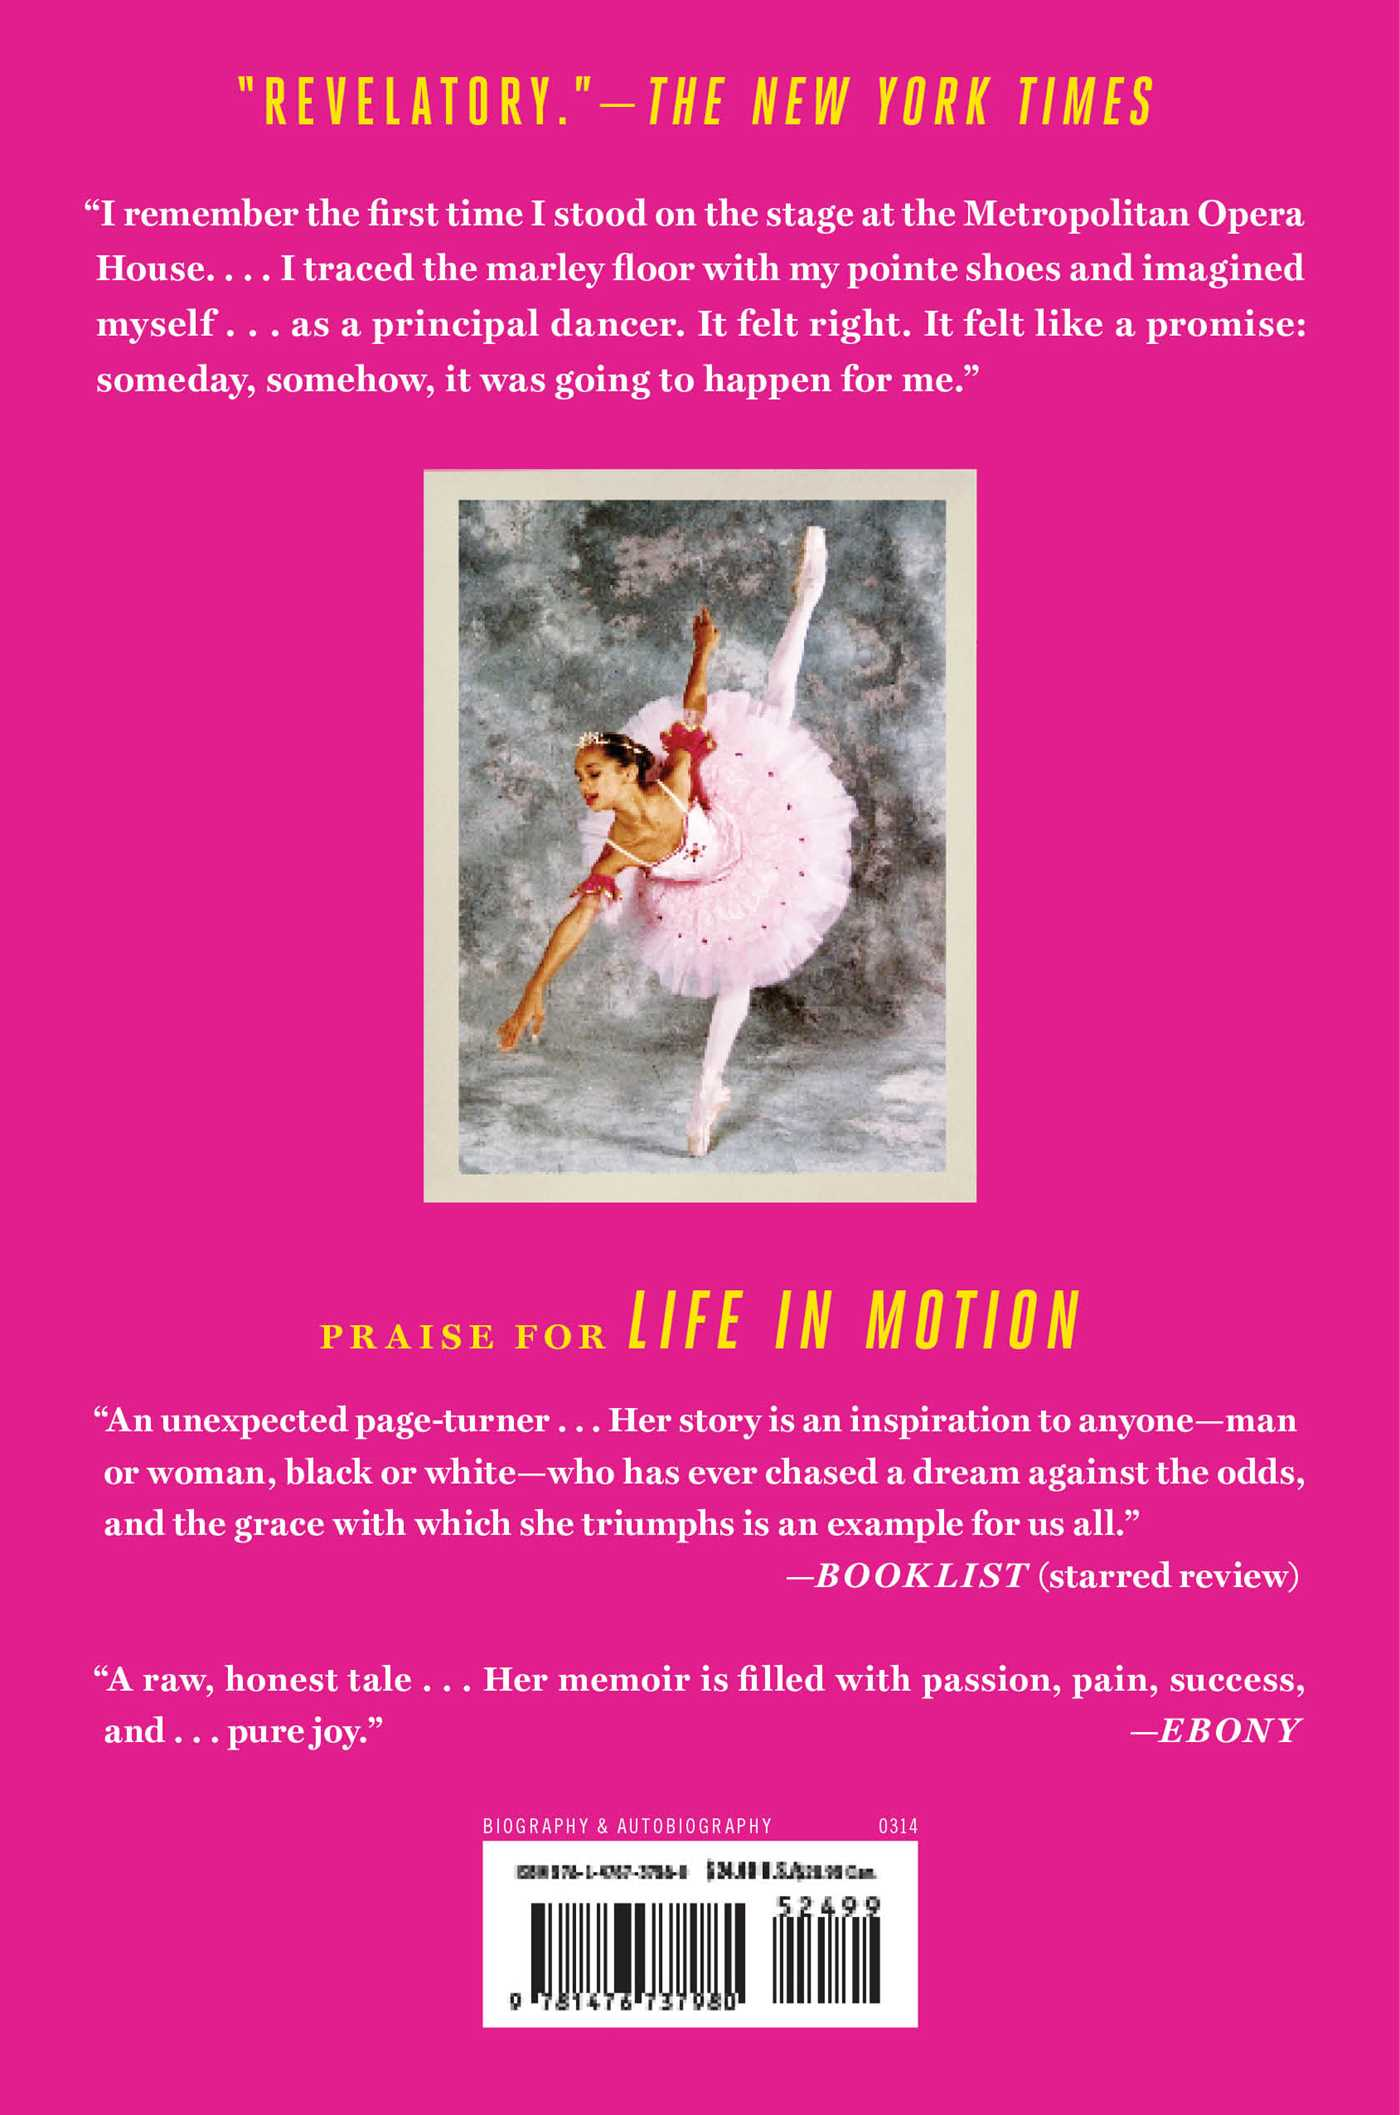 Life in motion 9781476737980 hr back